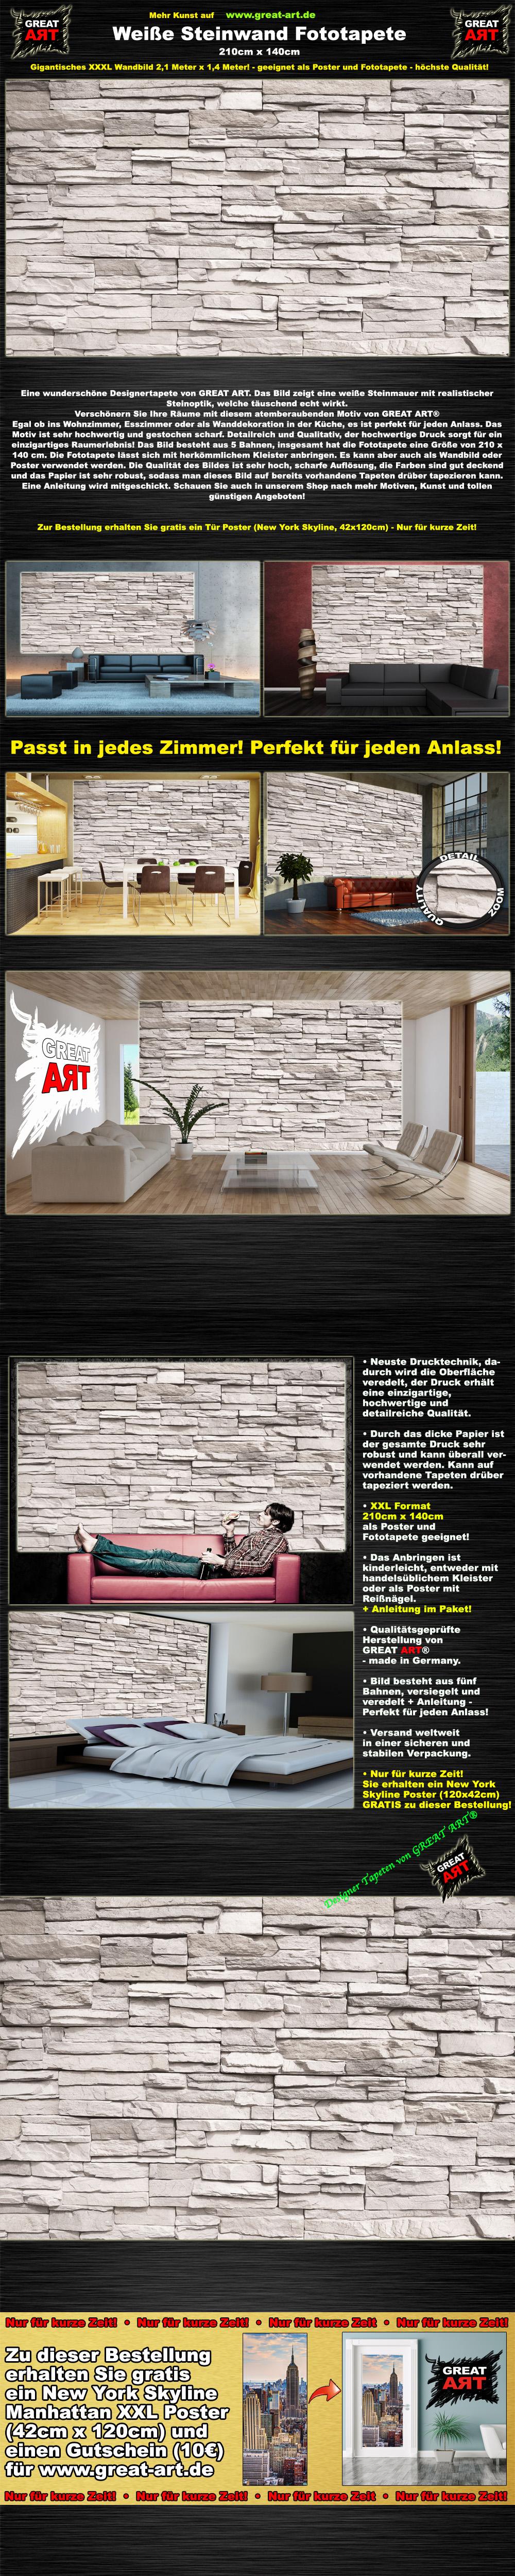 wei e steinwand steinoptik fototapete by great art 210 cm x 140 cm ovp 39 ebay. Black Bedroom Furniture Sets. Home Design Ideas